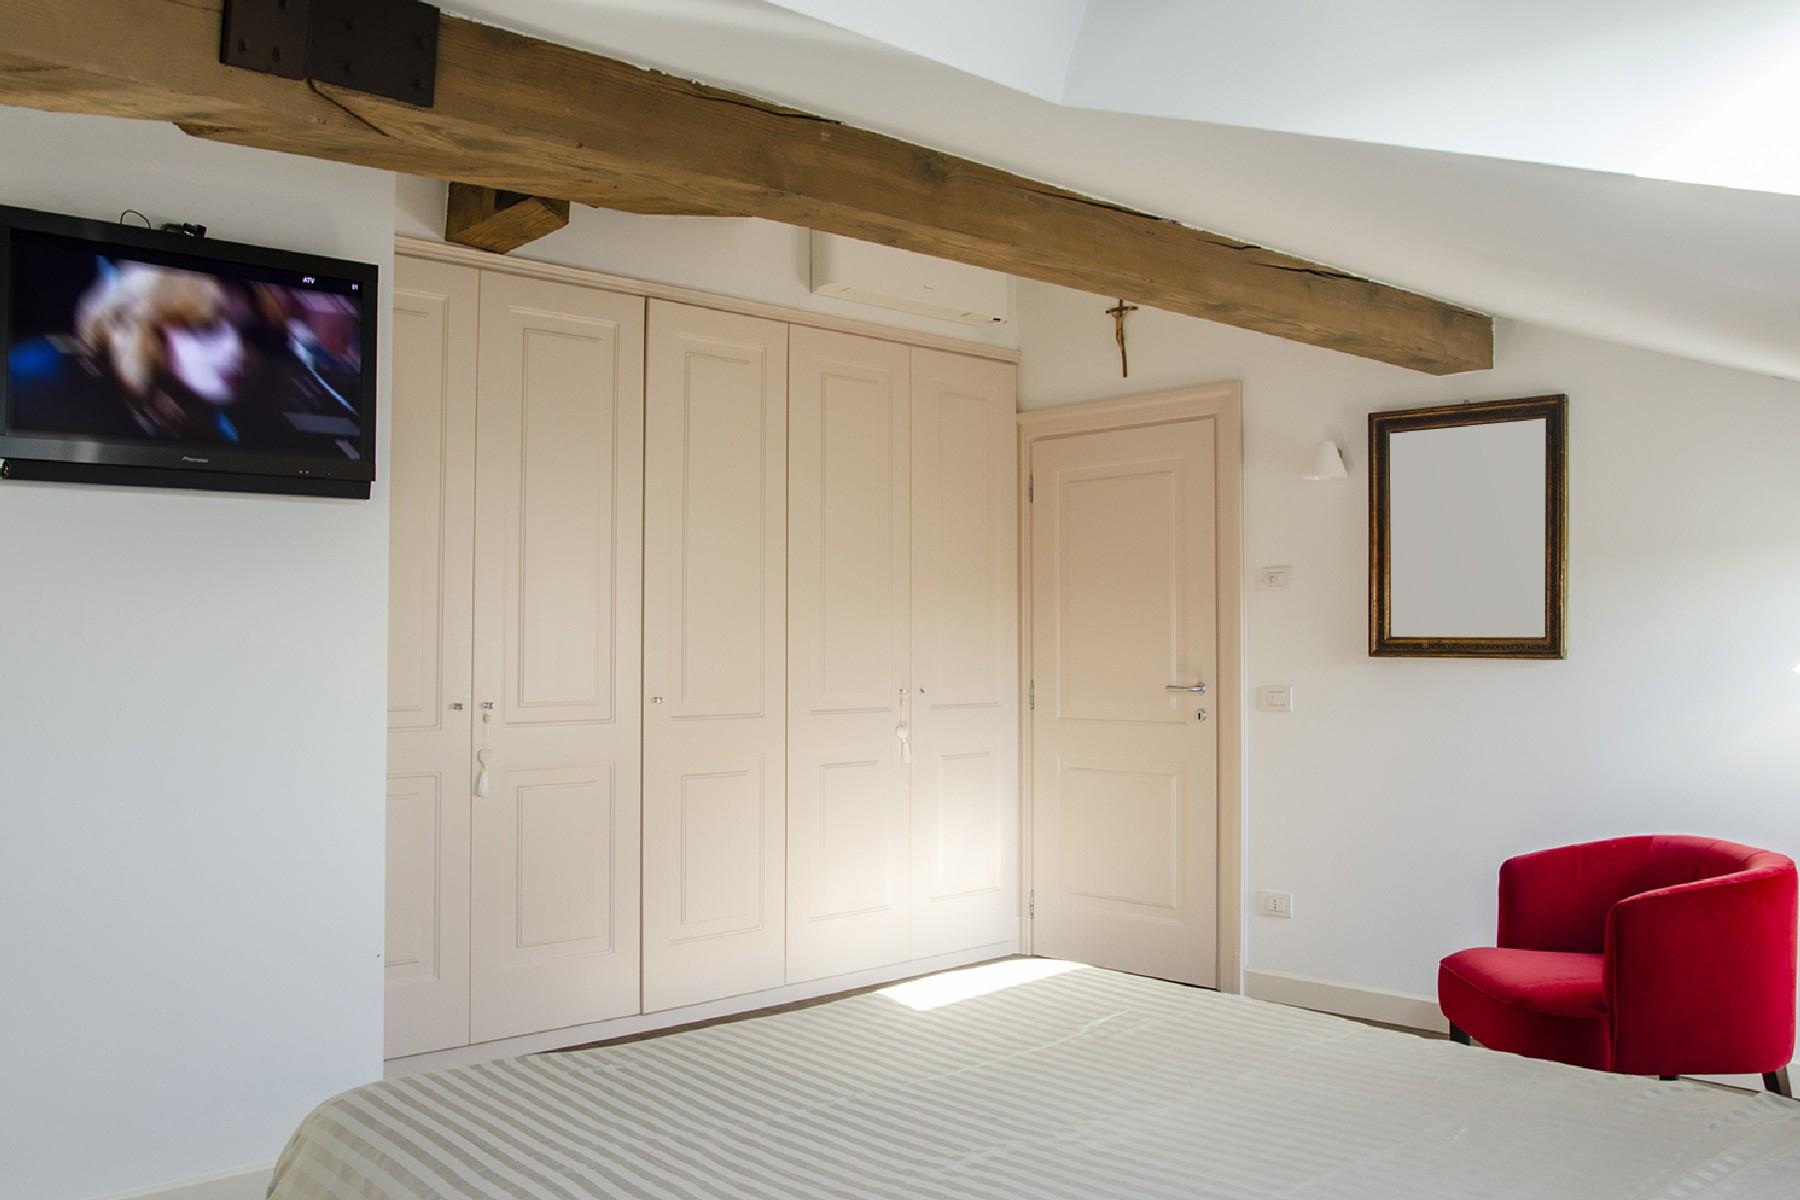 Appartamento in Vendita a Merate: 4 locali, 225 mq - Foto 19